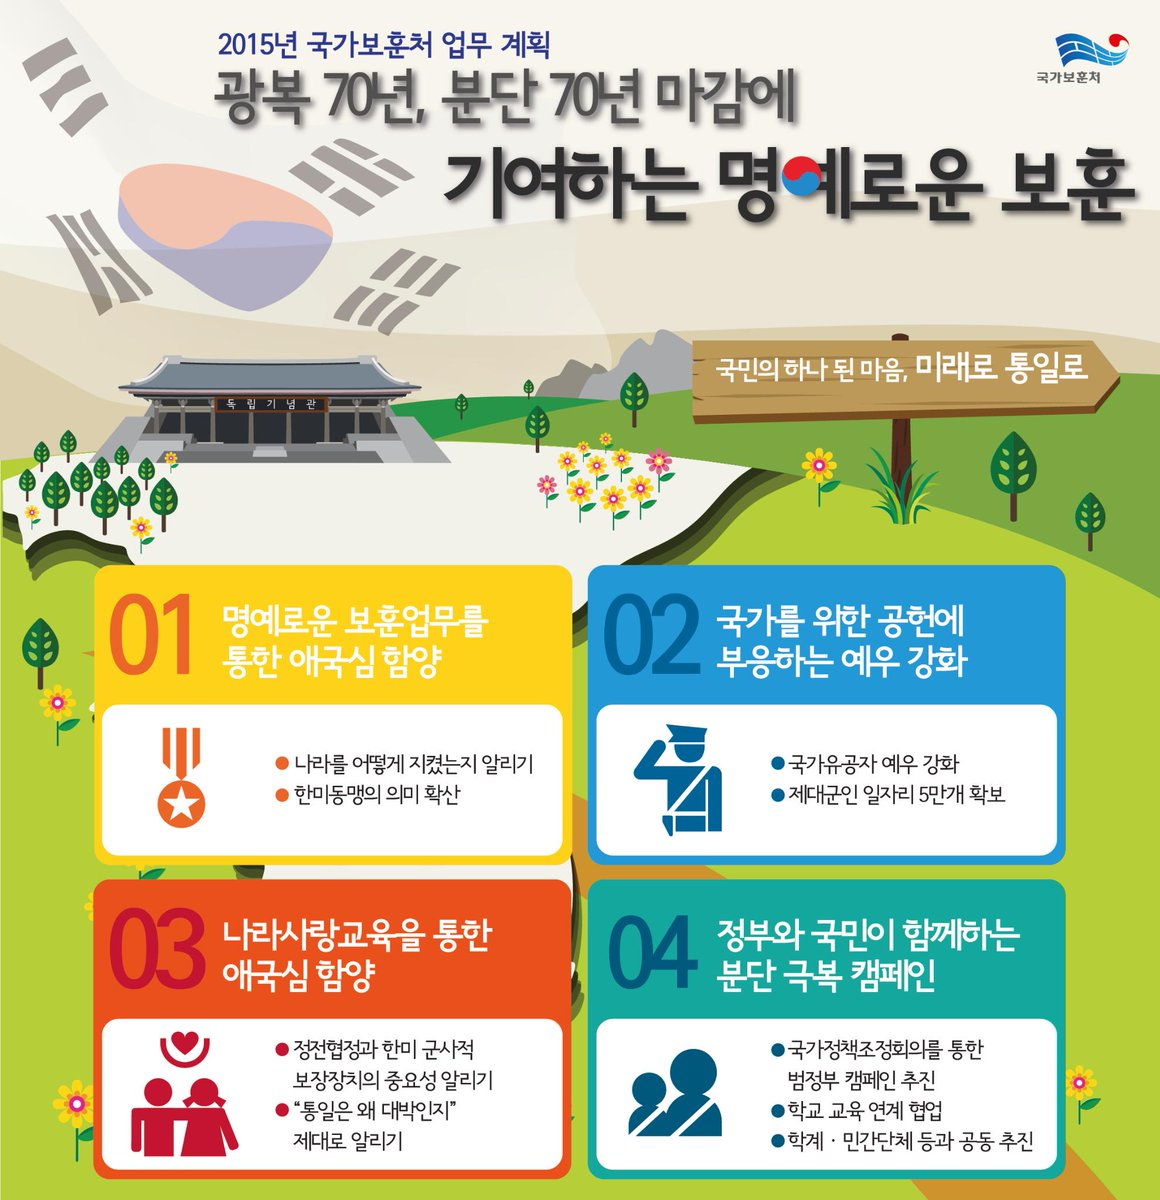 [RT이벤트]2015년 국가보훈처는 광복70년, 분단70년 마감에 기여하는 명예로운 보훈을 위해 최선을 다하겠습니다!(~2.11) http://t.co/Knrex1Bpmk #2015명예로운보훈인포 http://t.co/KdkslAXIVZ